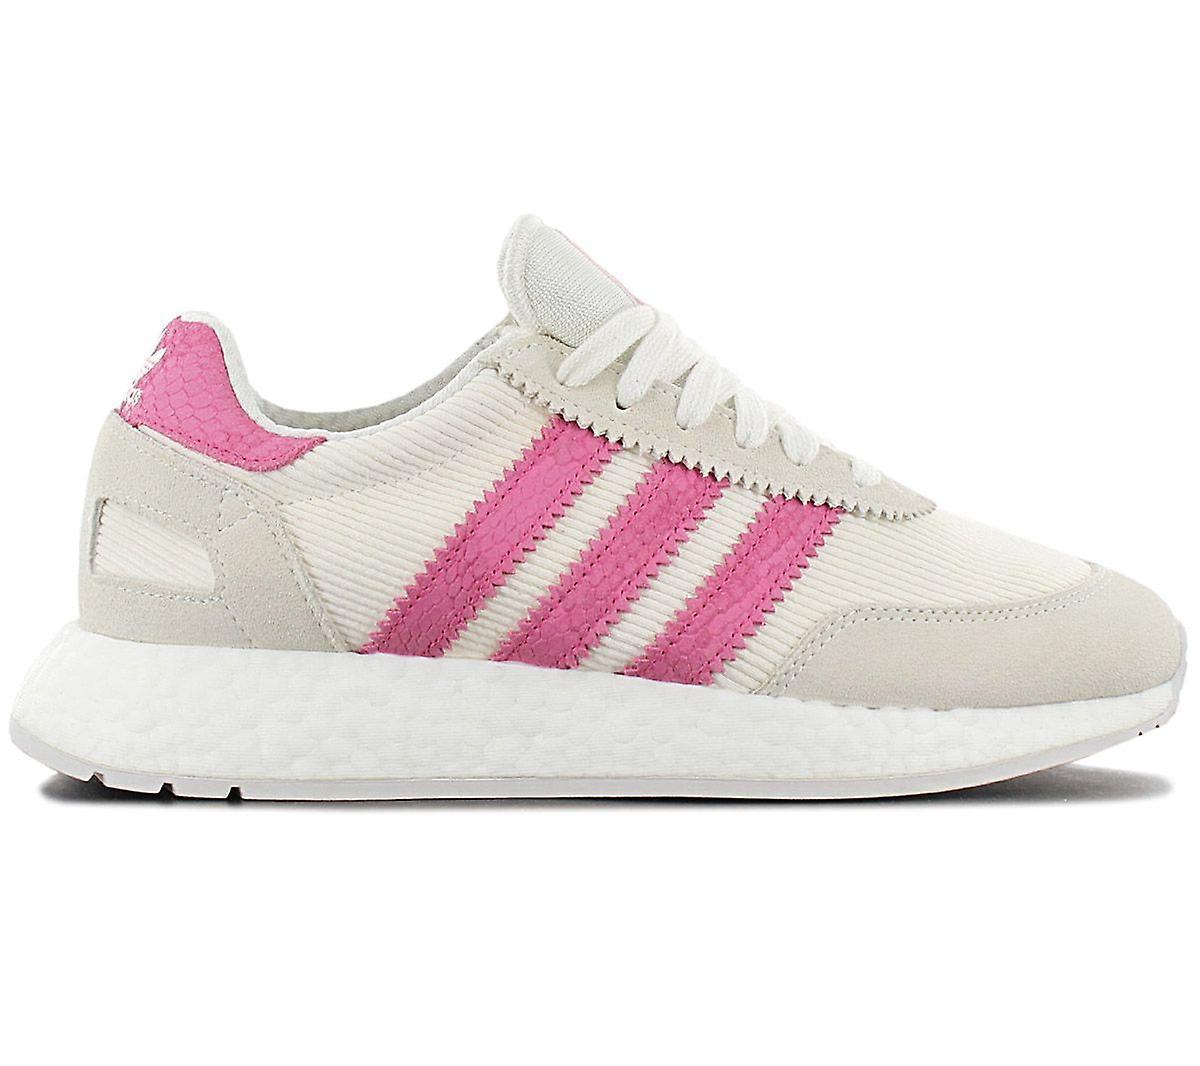 adidas Originals Iniki I-5923 W Boost - Damen Schuhe Beige-Rosa D96618 Sneakers Sportschuhe pCugM